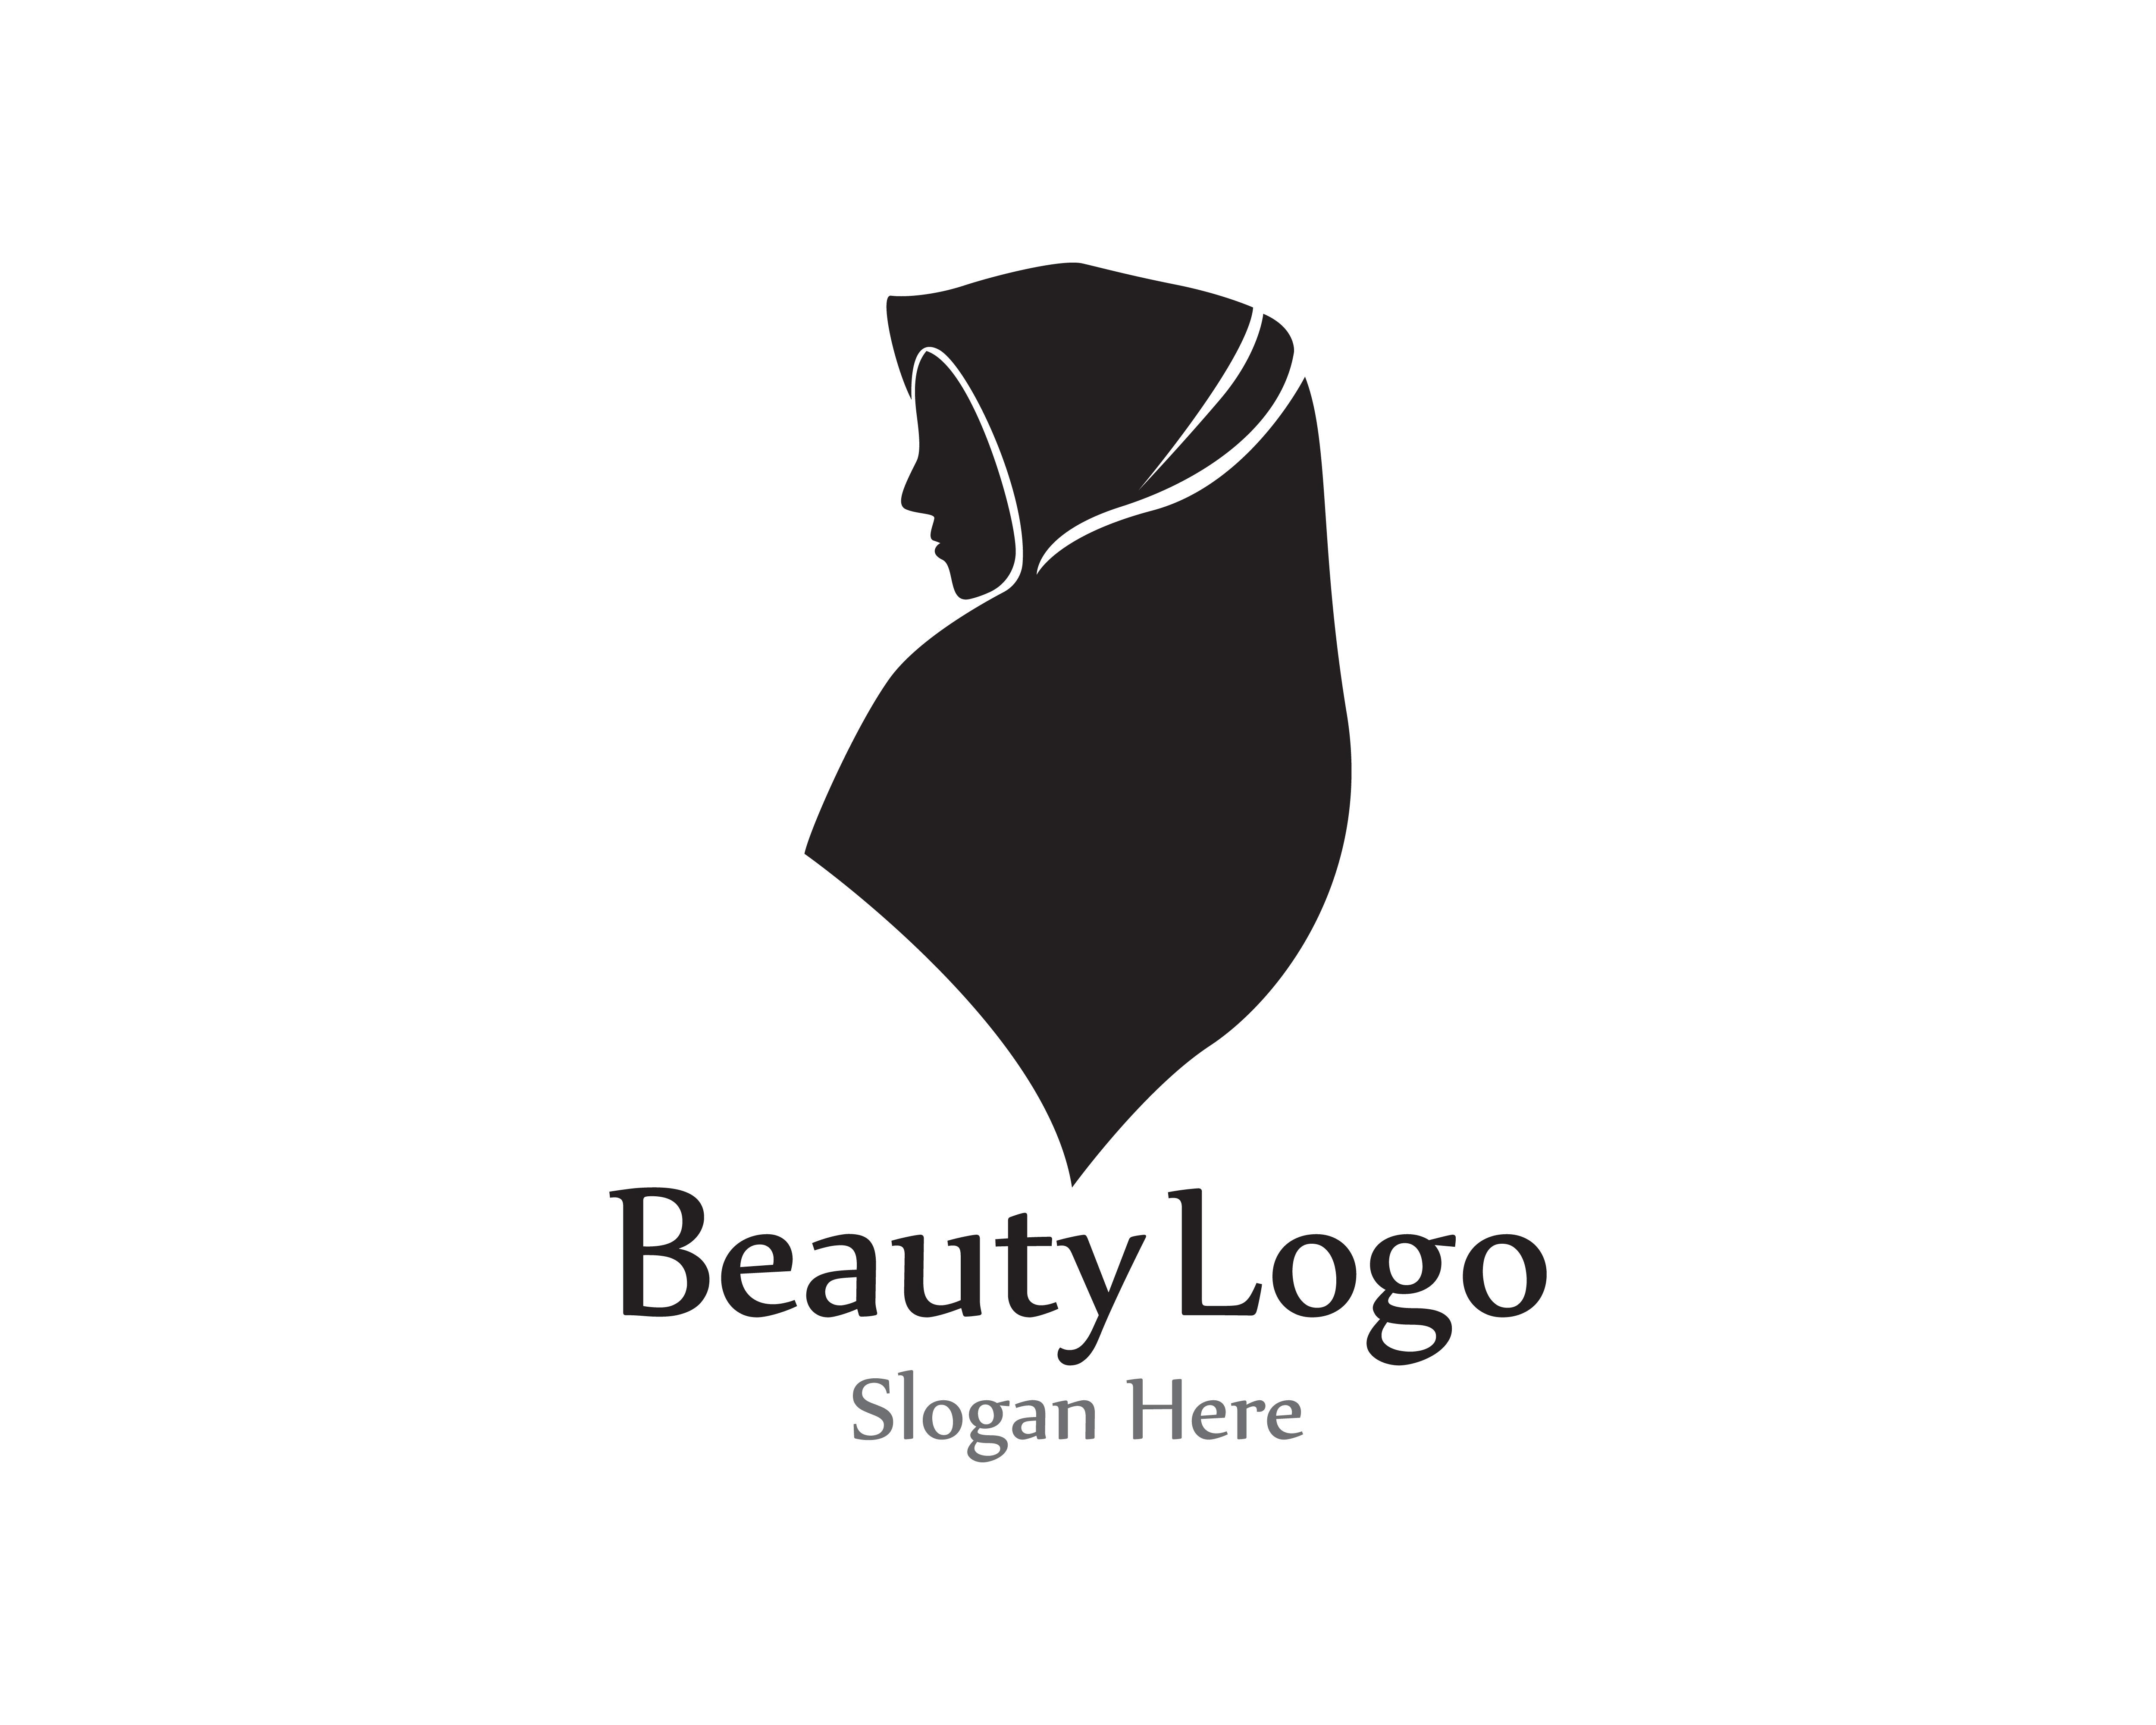 Hijab Silhouette Free Vector Art